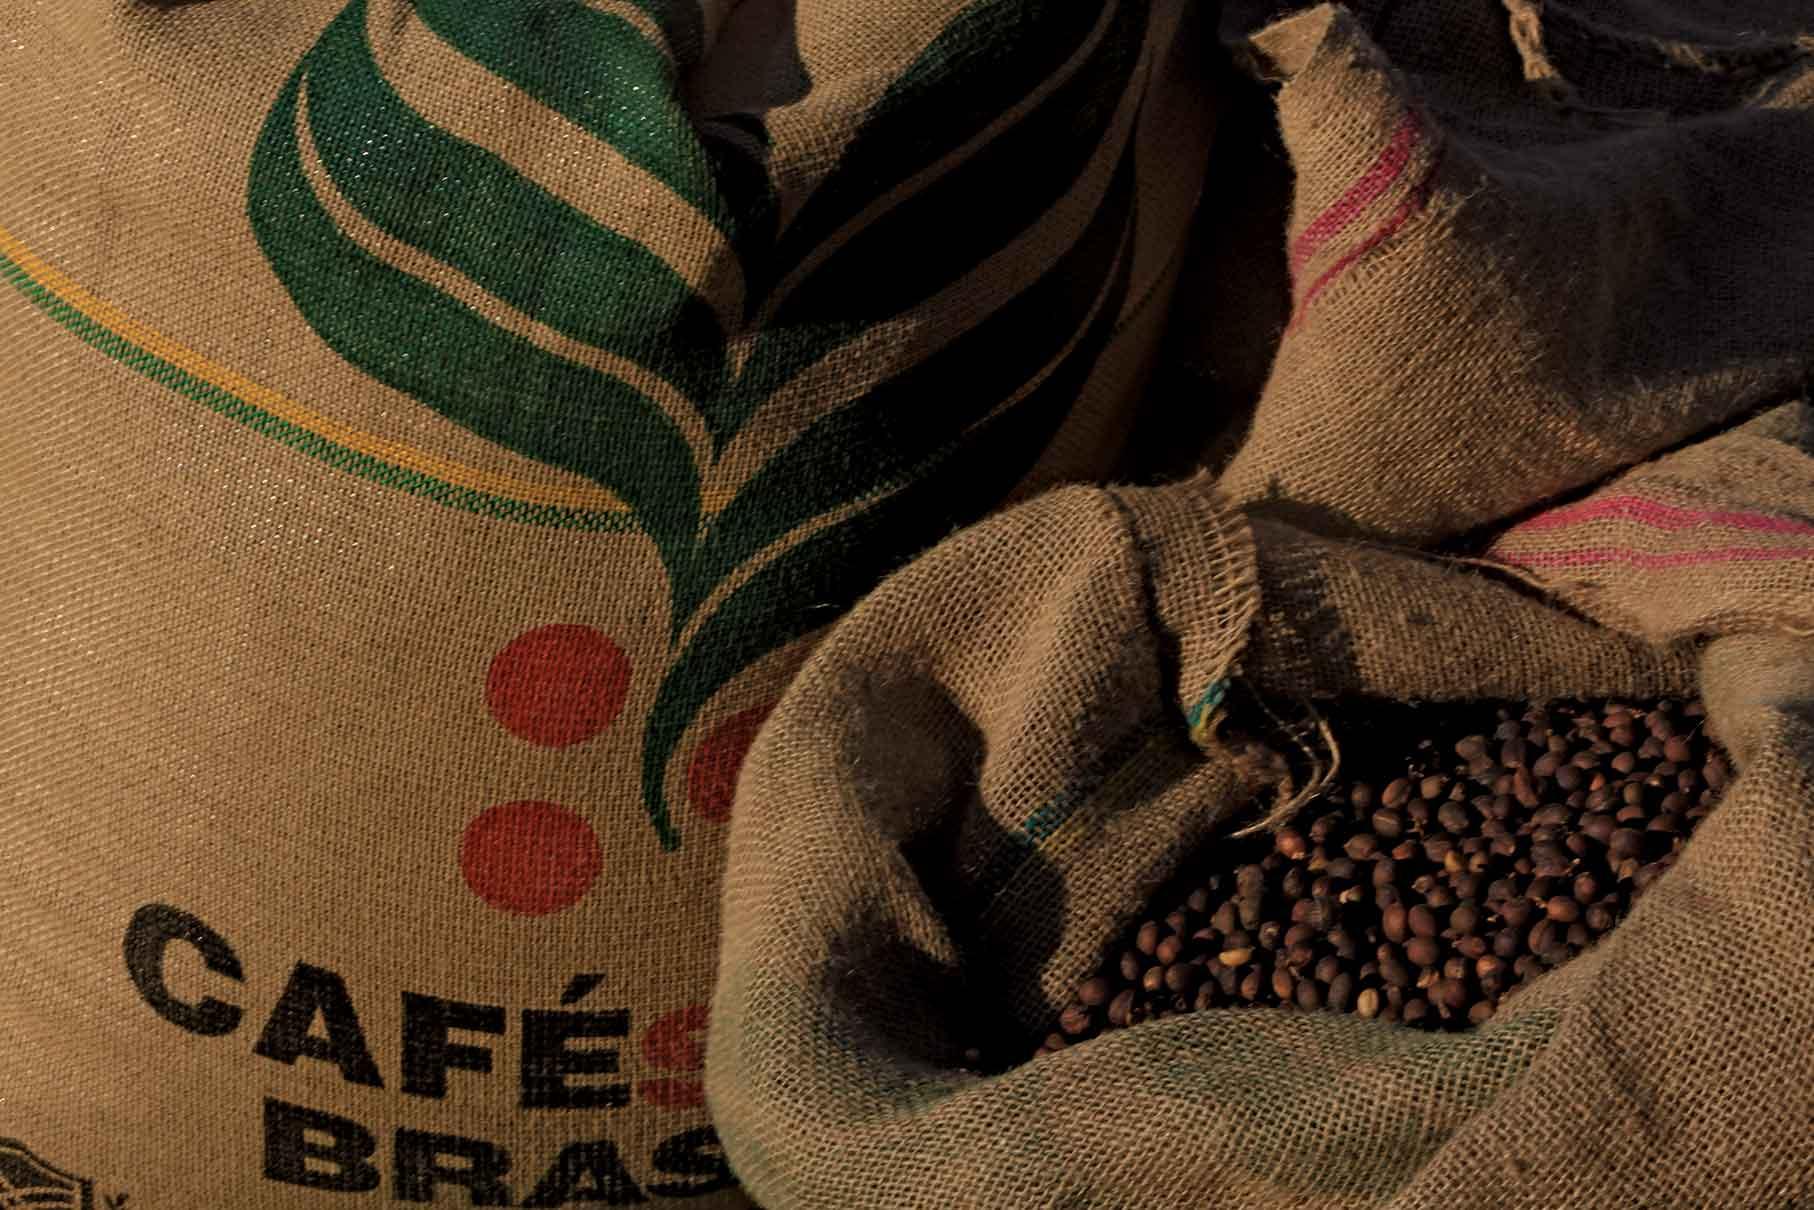 Braganca-Paulista-Aromas-e-Sabores-cafe-IMG_9677-bx